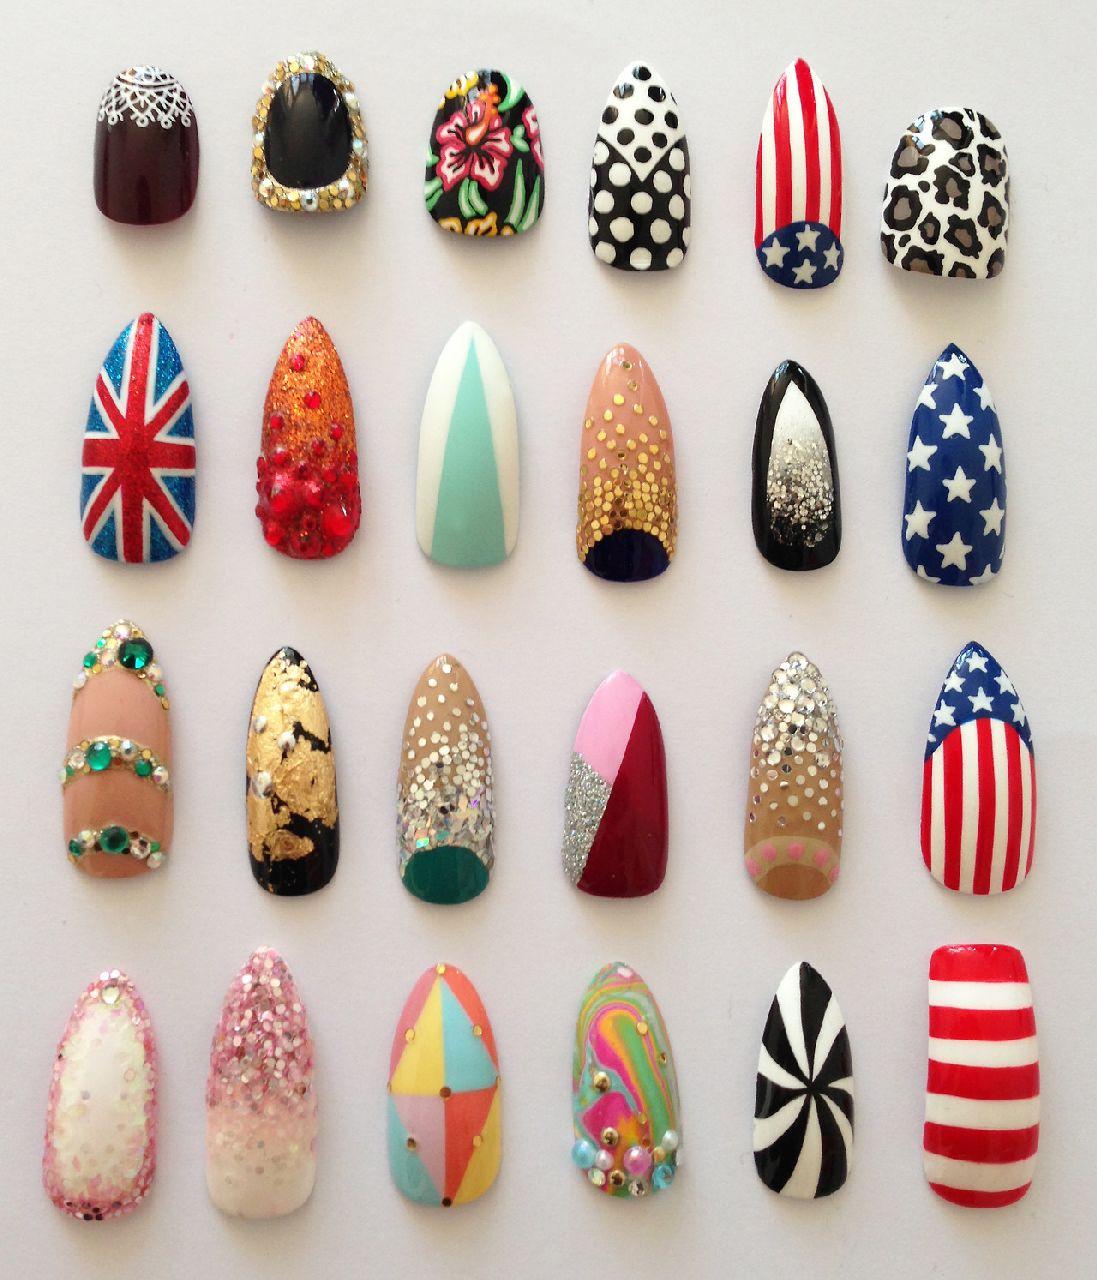 Nail Art Ideas » Klutz Nail Art - Pictures of Nail Art Design Ideas